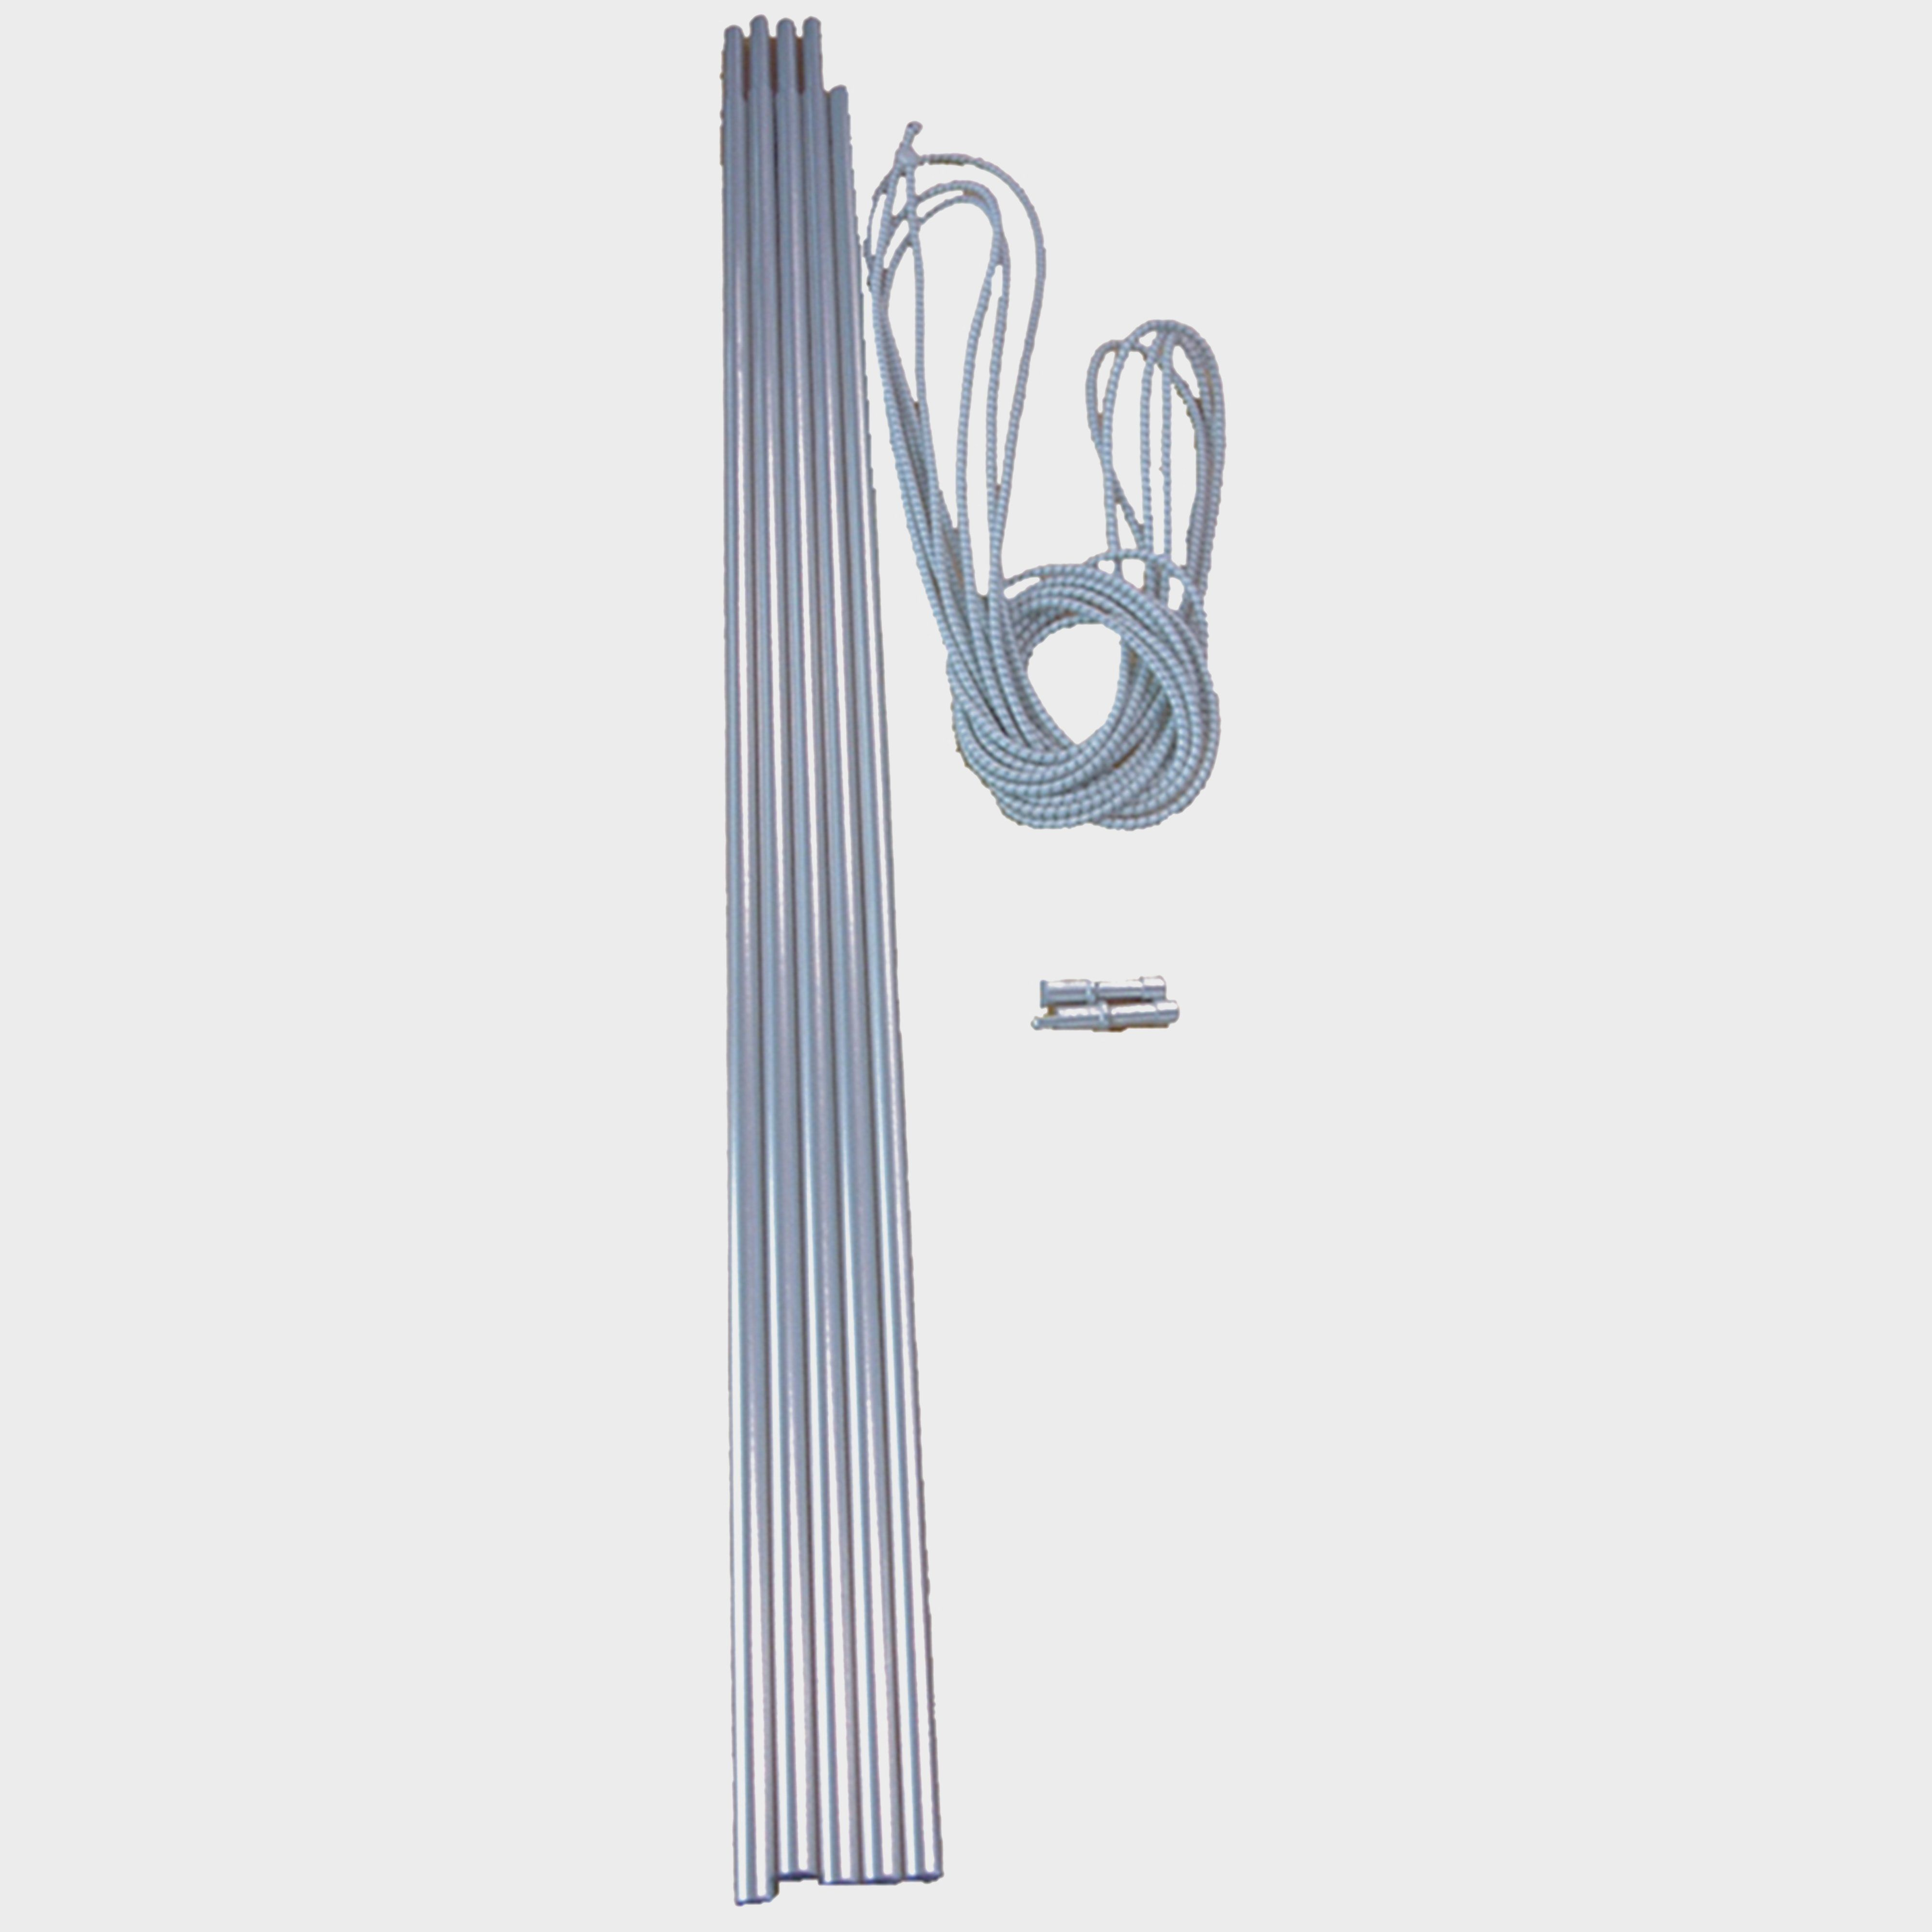 VANGO Alloy Corded 9.5mm Tent Pole Set